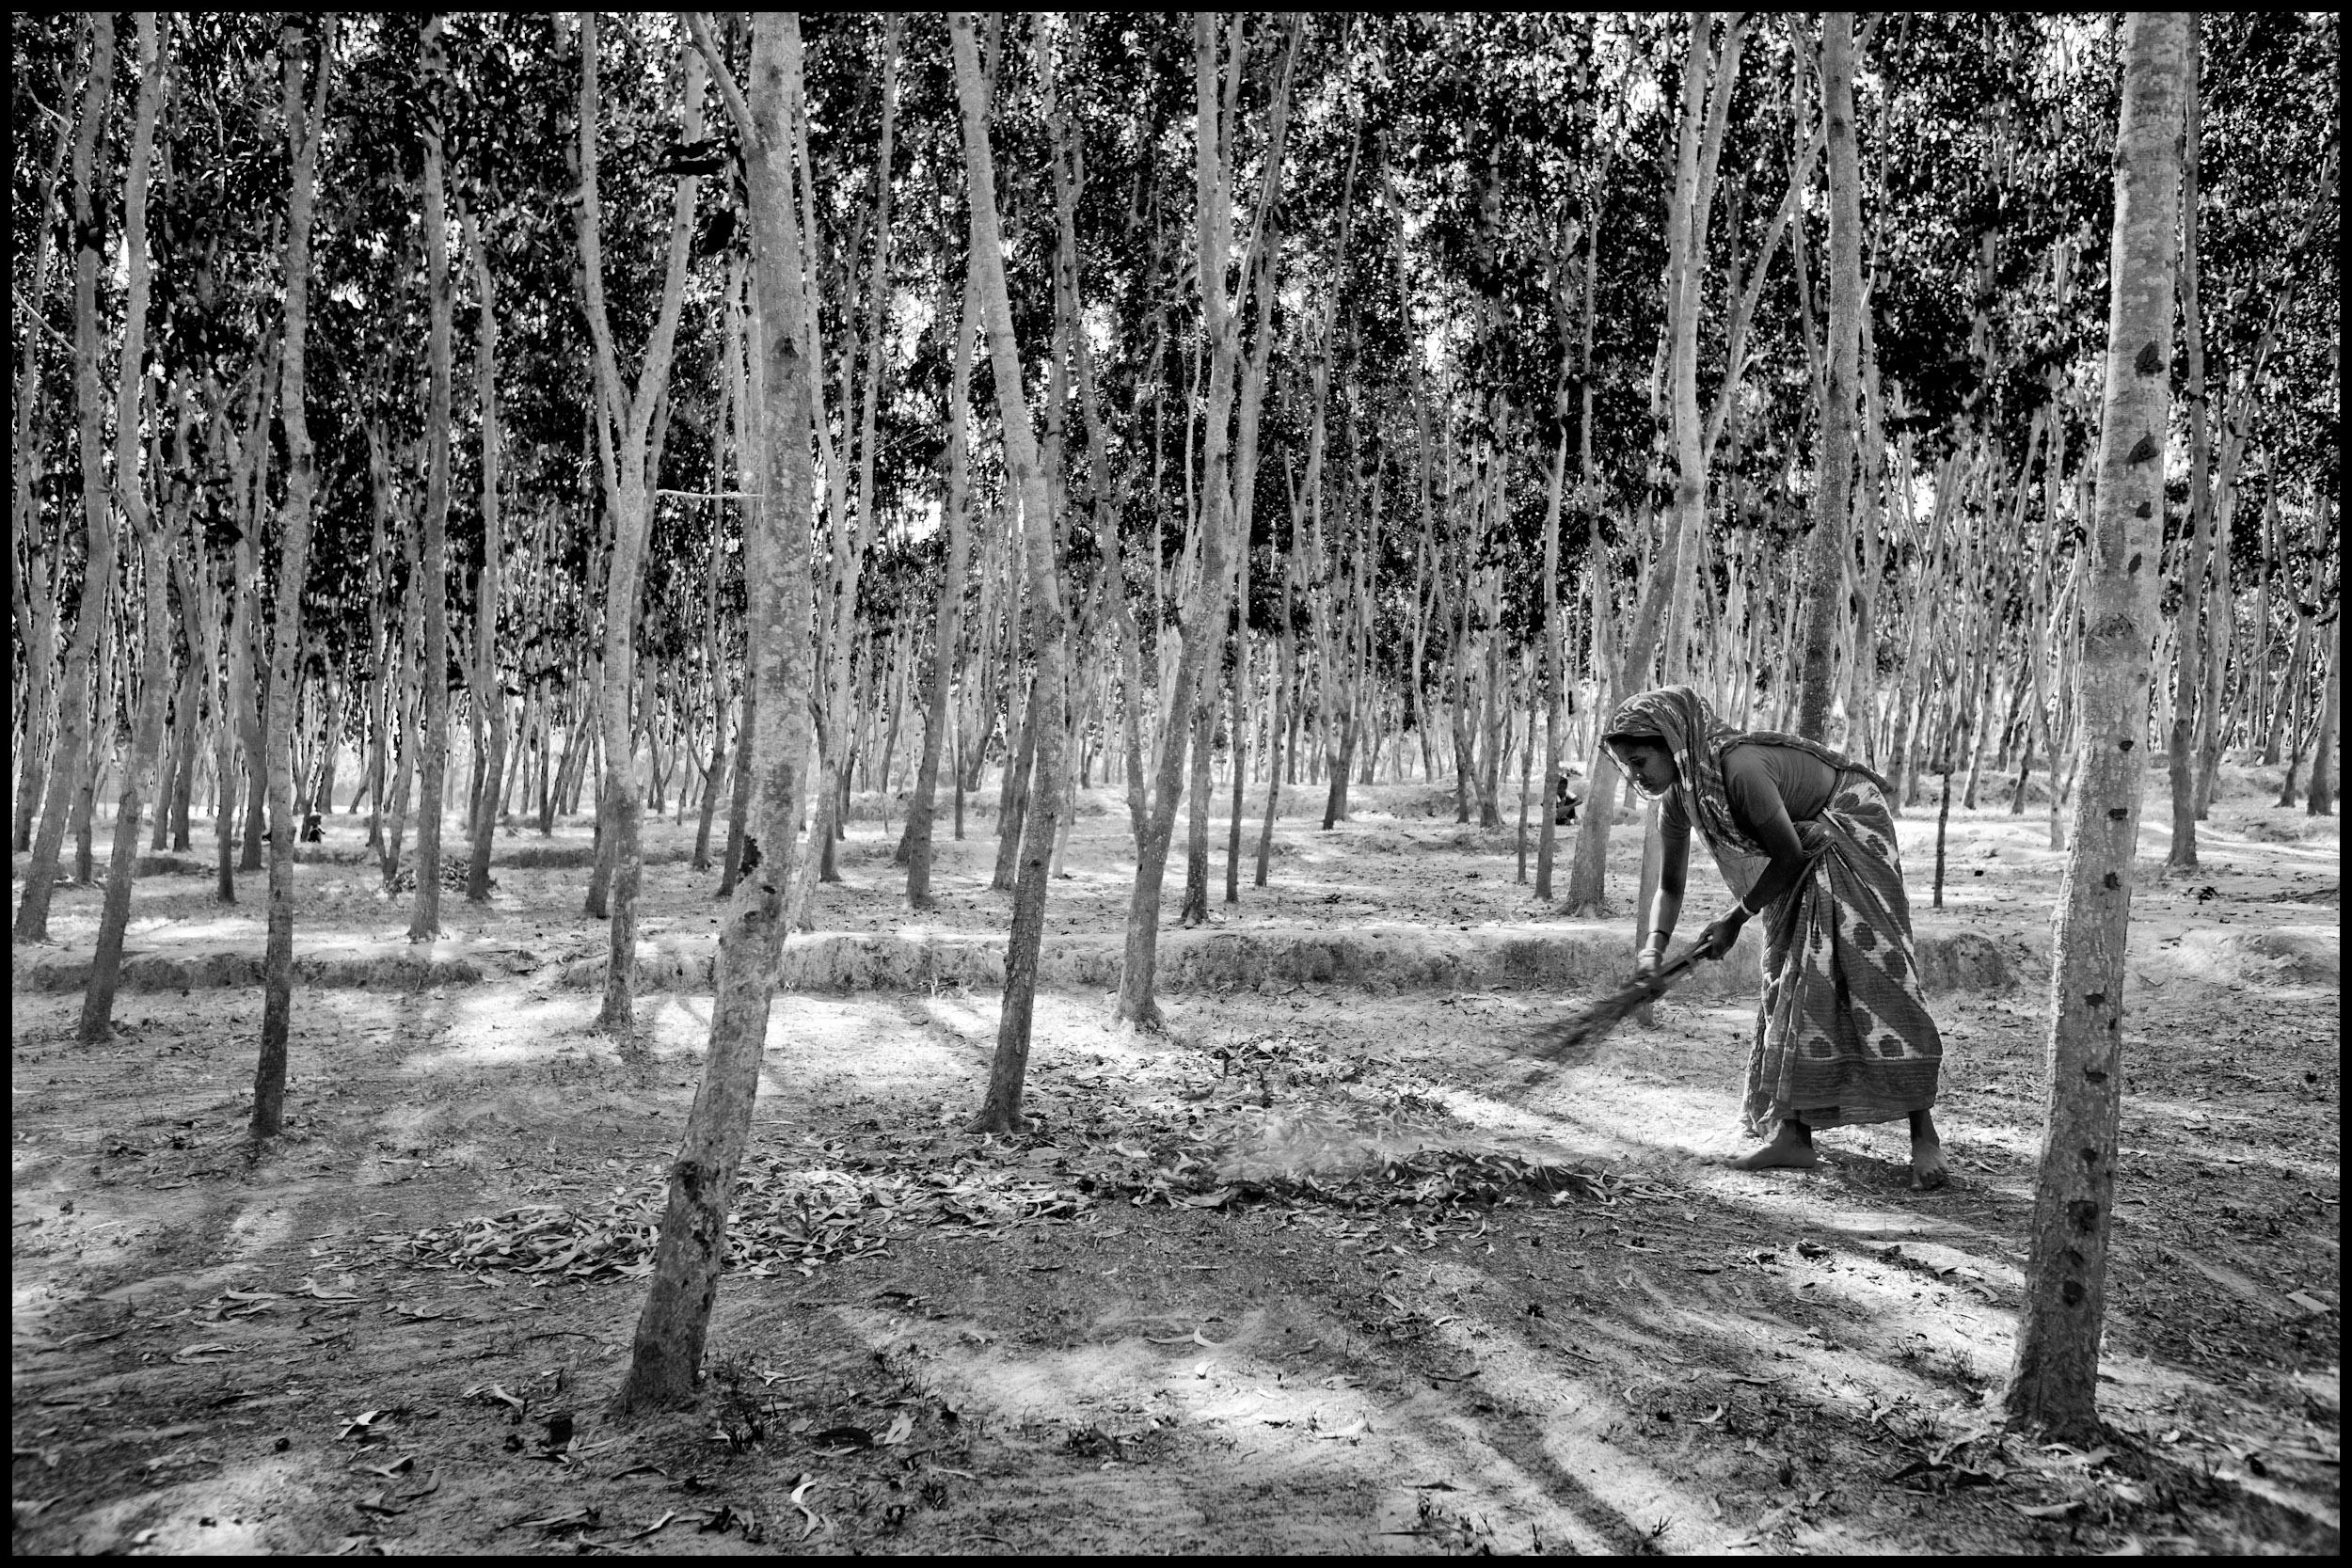 Zoriah A Photojournalist And War Photographers Blog Rohingya Sandal Connec Arizona Navy Fuchsia Woman 36 0001 Photographer Refugee 20100302 0347